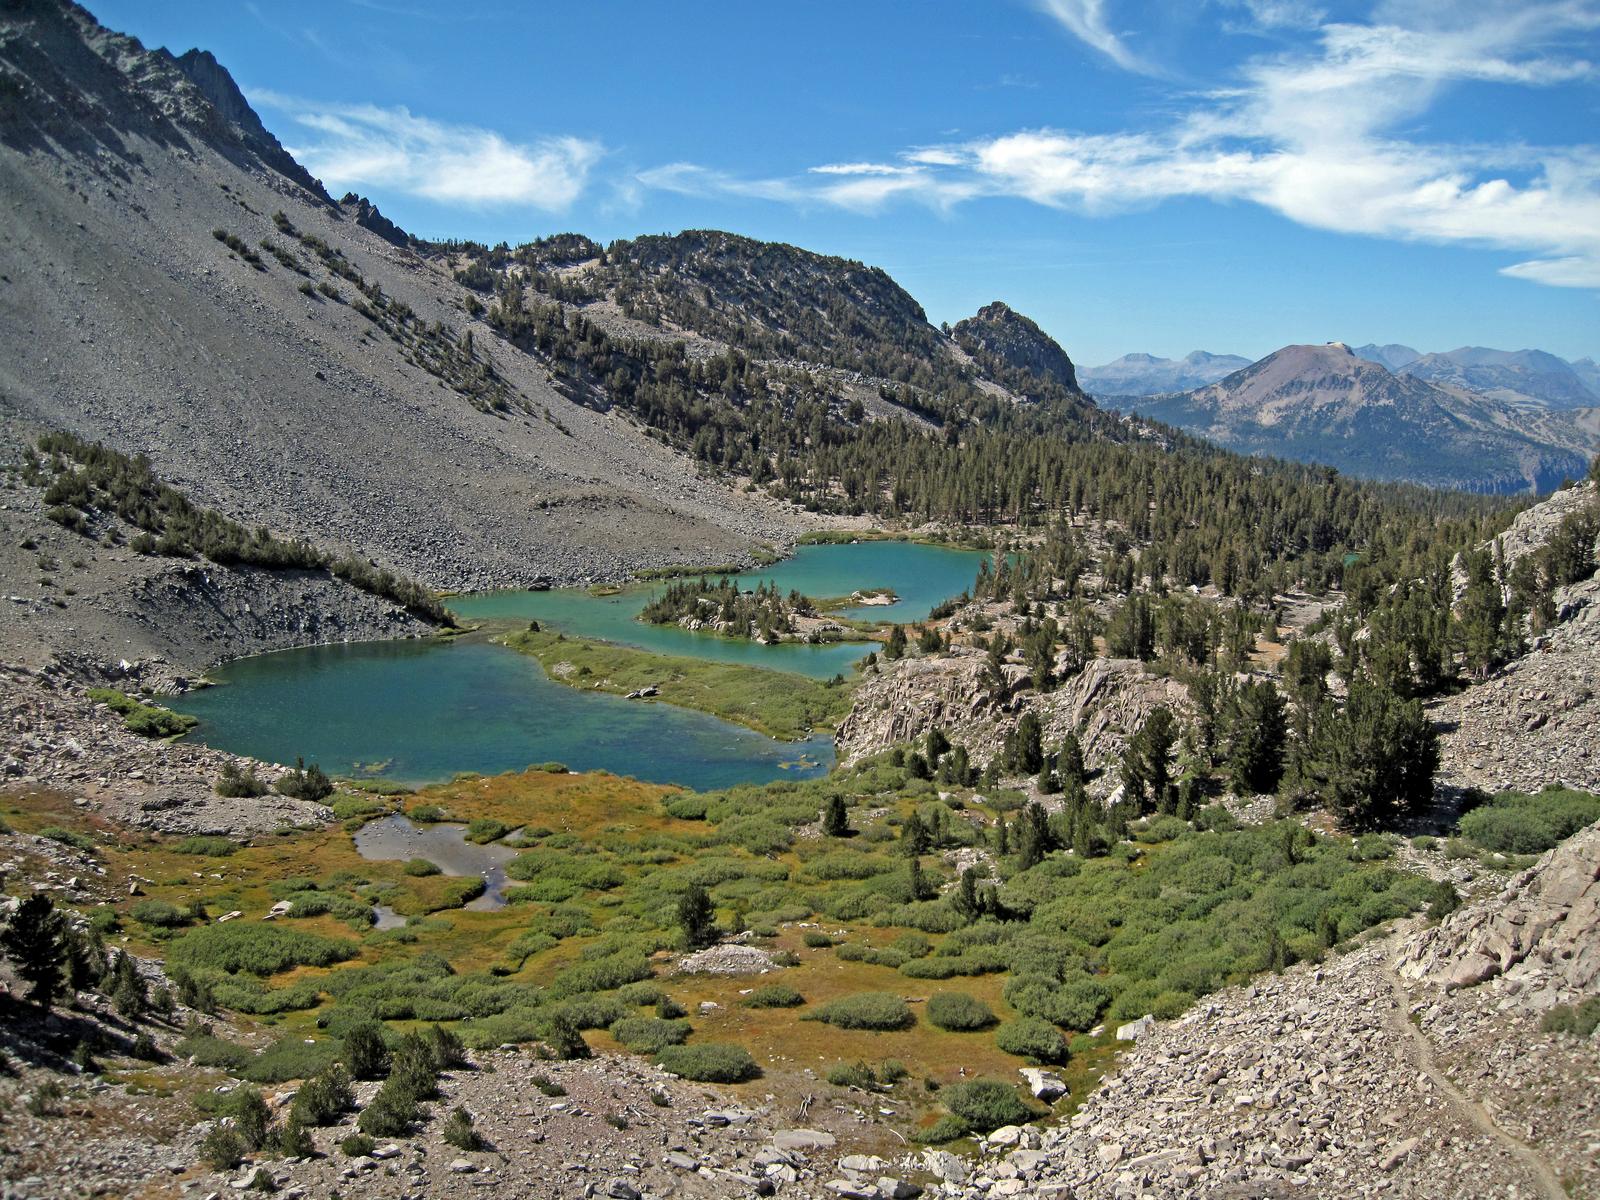 north of Duck Pass, near Mammoth Lakes, CA